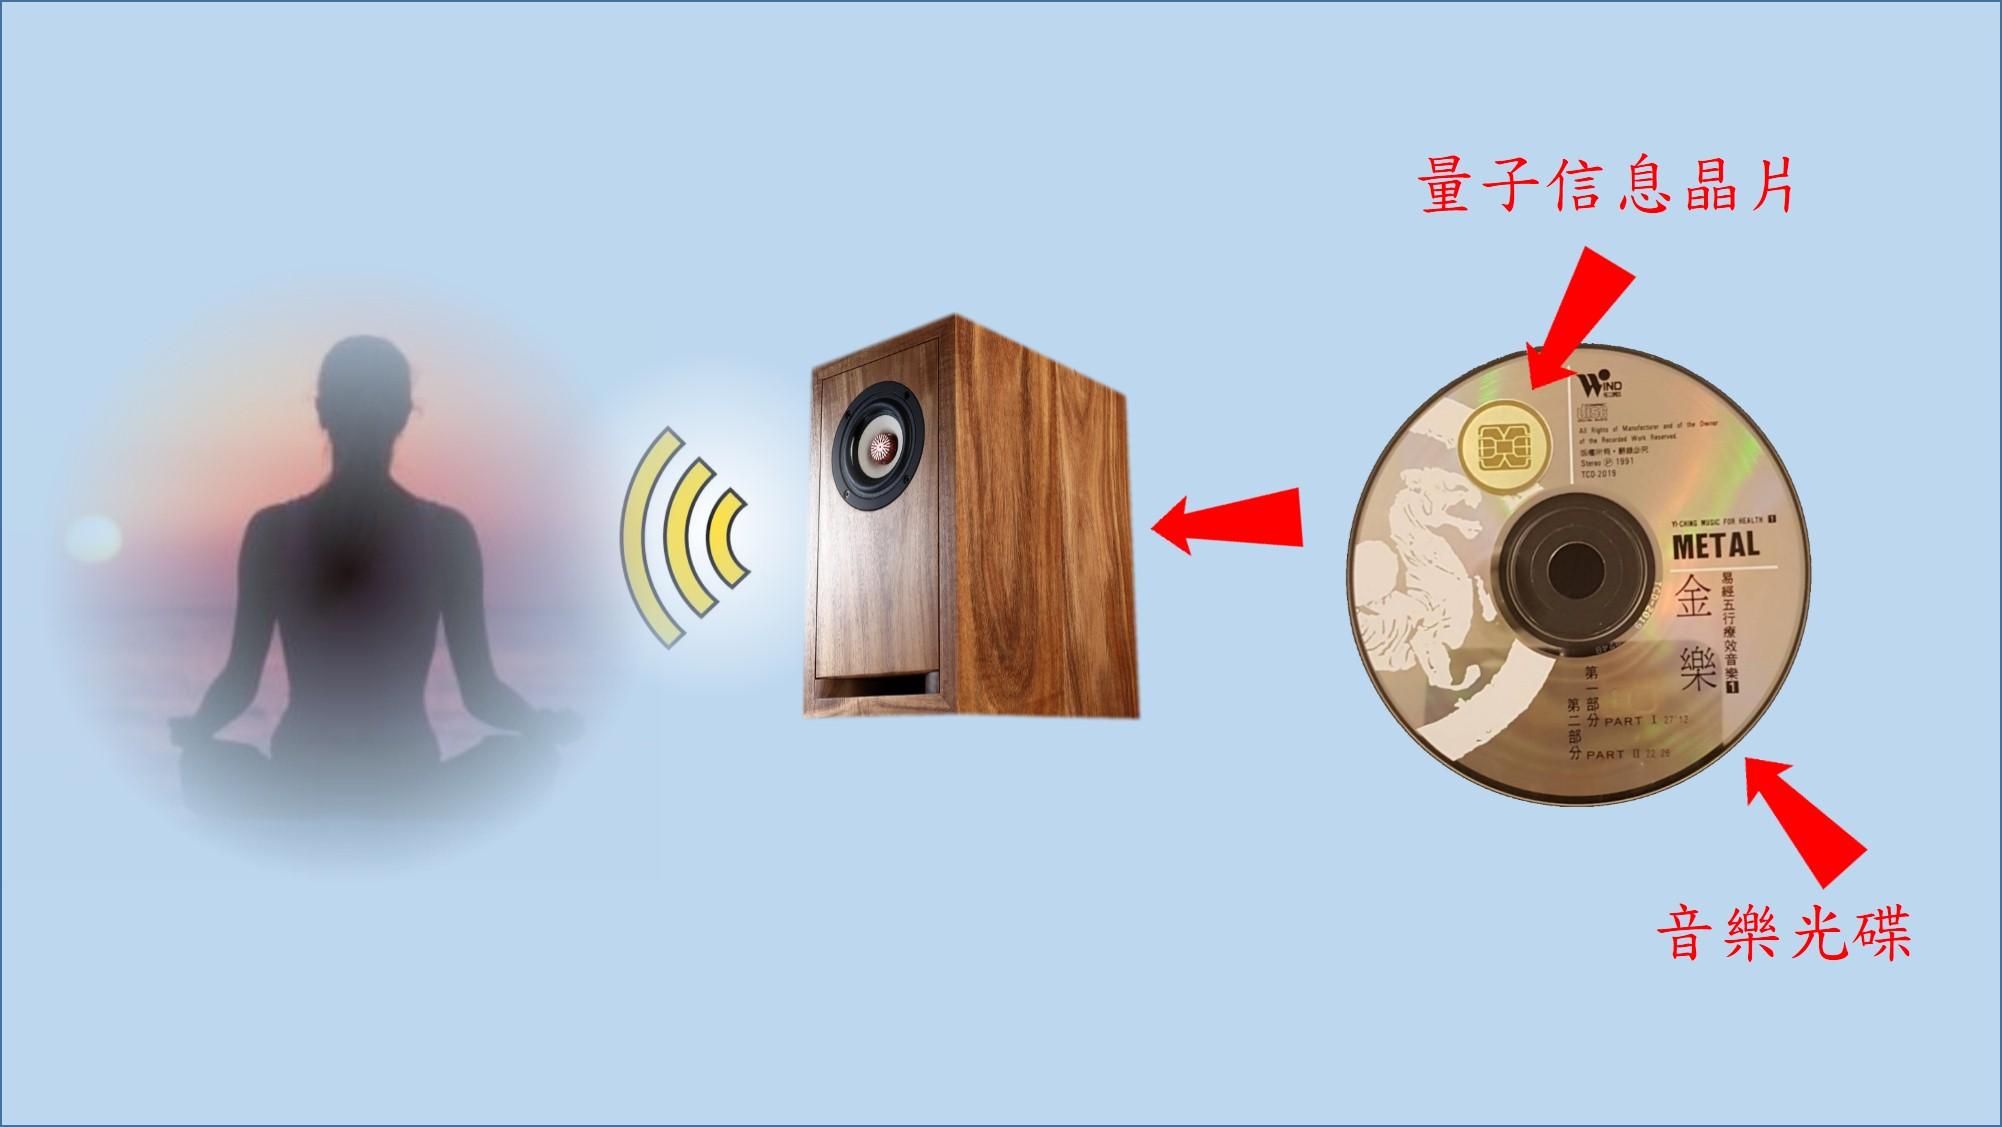 http://taiwancom.tw/biochip/biowell-20.jpg